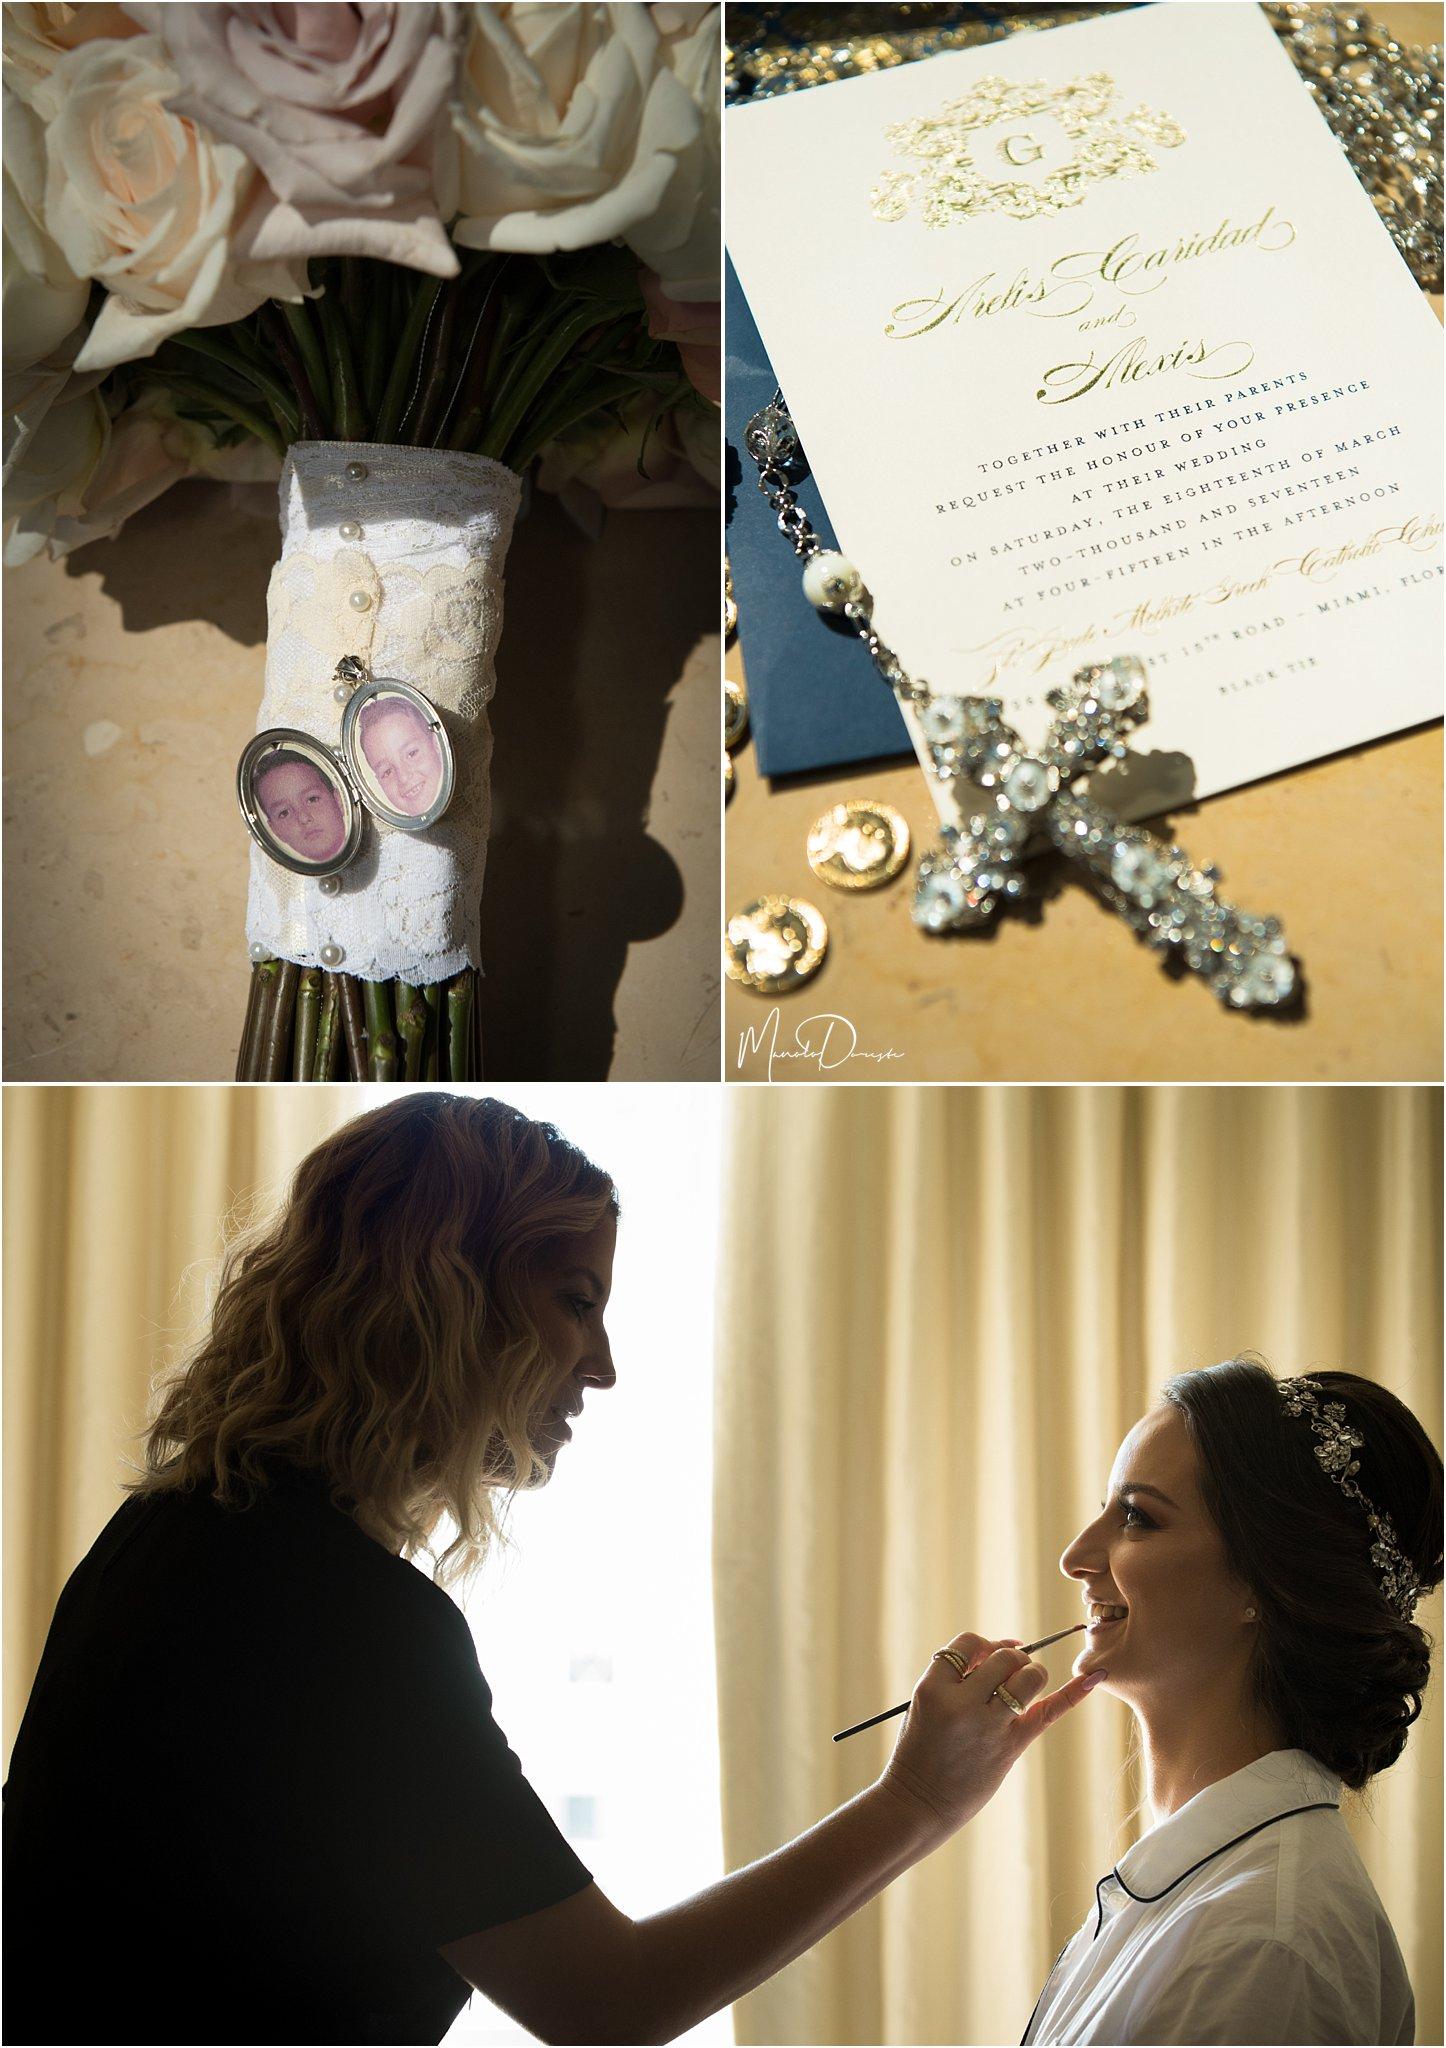 00710_ManoloDoreste_InFocusStudios_Wedding_Family_Photography_Miami_MiamiPhotographer.jpg